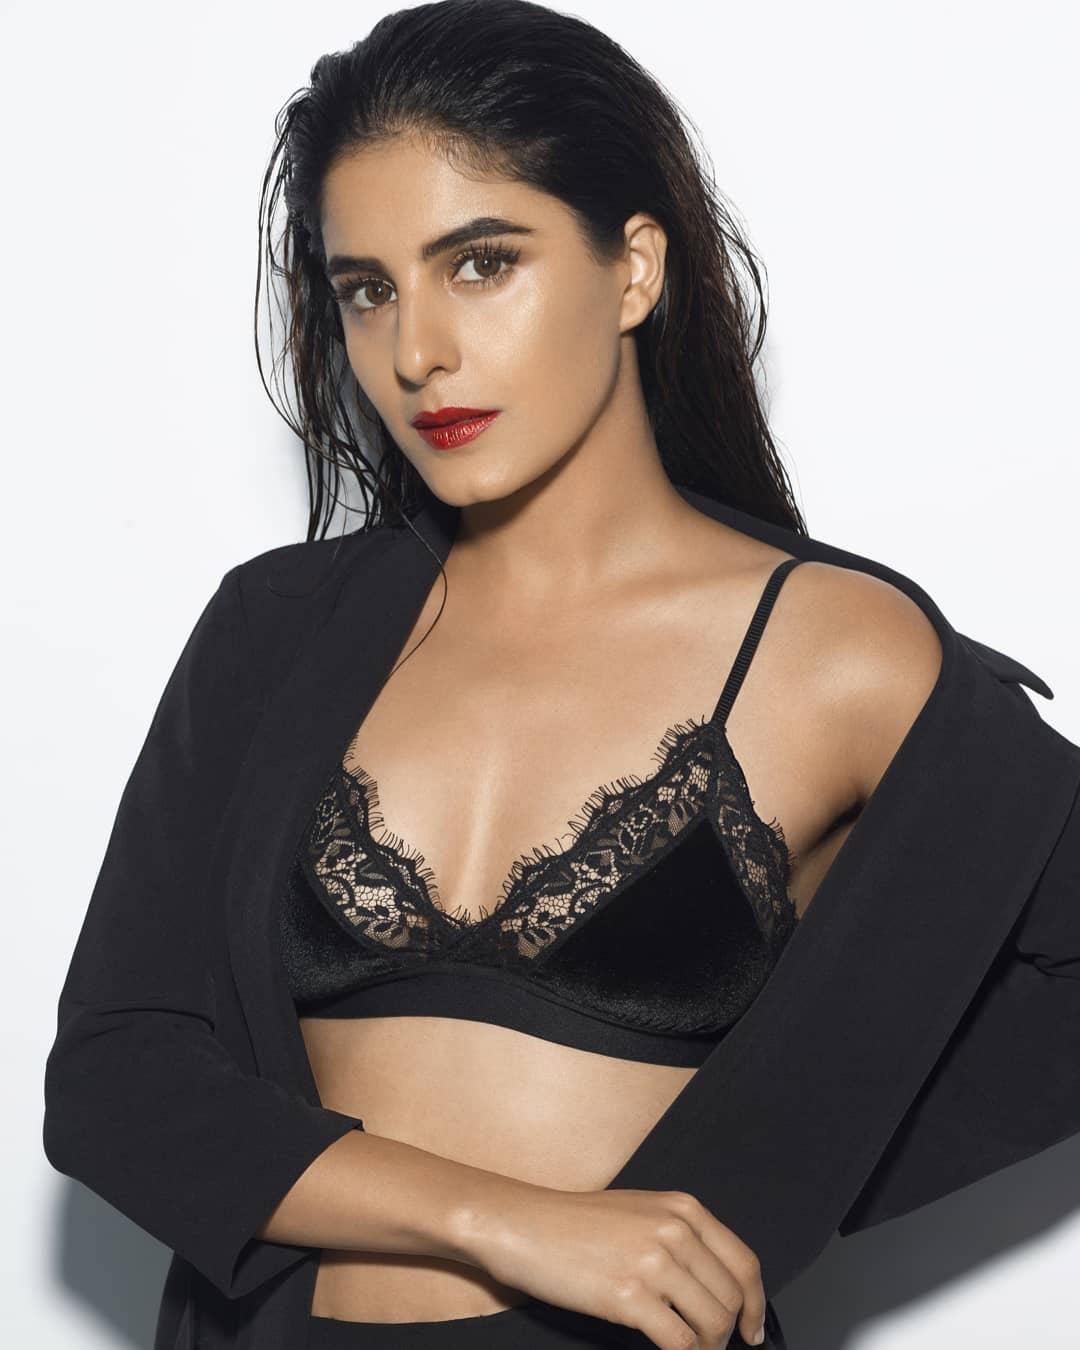 isha-talwar-cleavage-show-in-net-bikini-bra